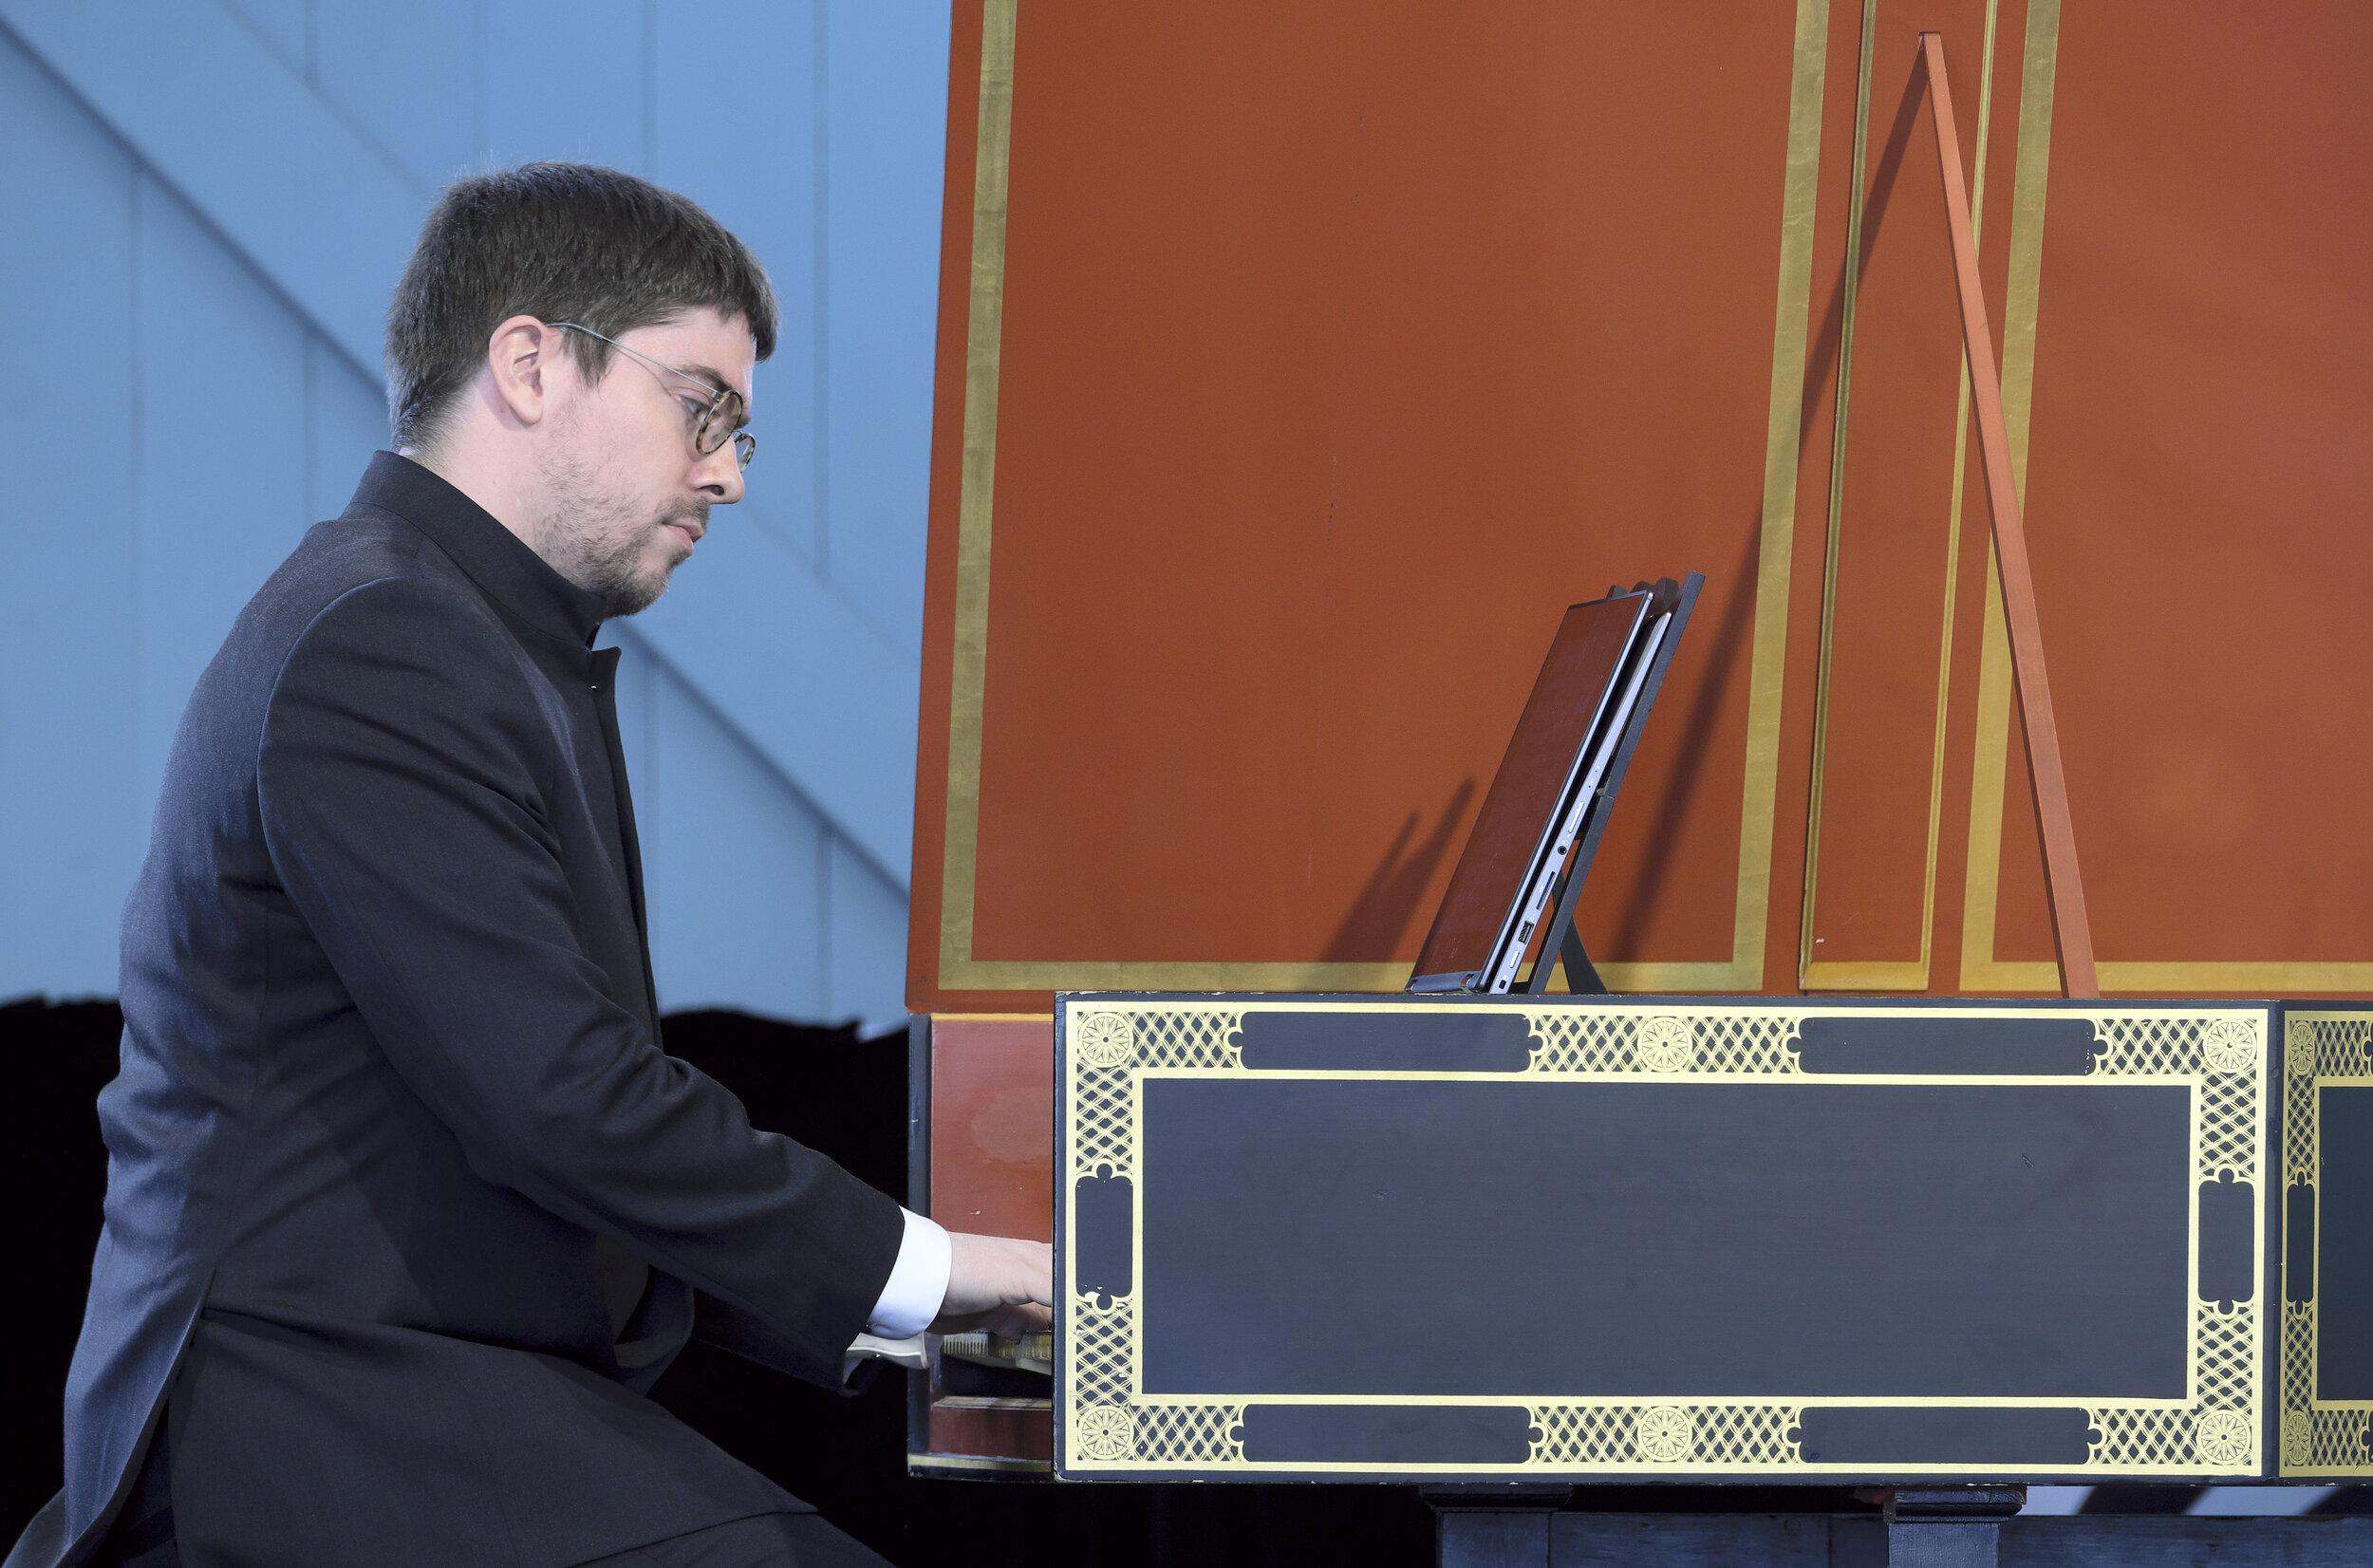 Concert 18. Prelude and Fugue. Korneel Bernolet. Photo by Peter Hislop